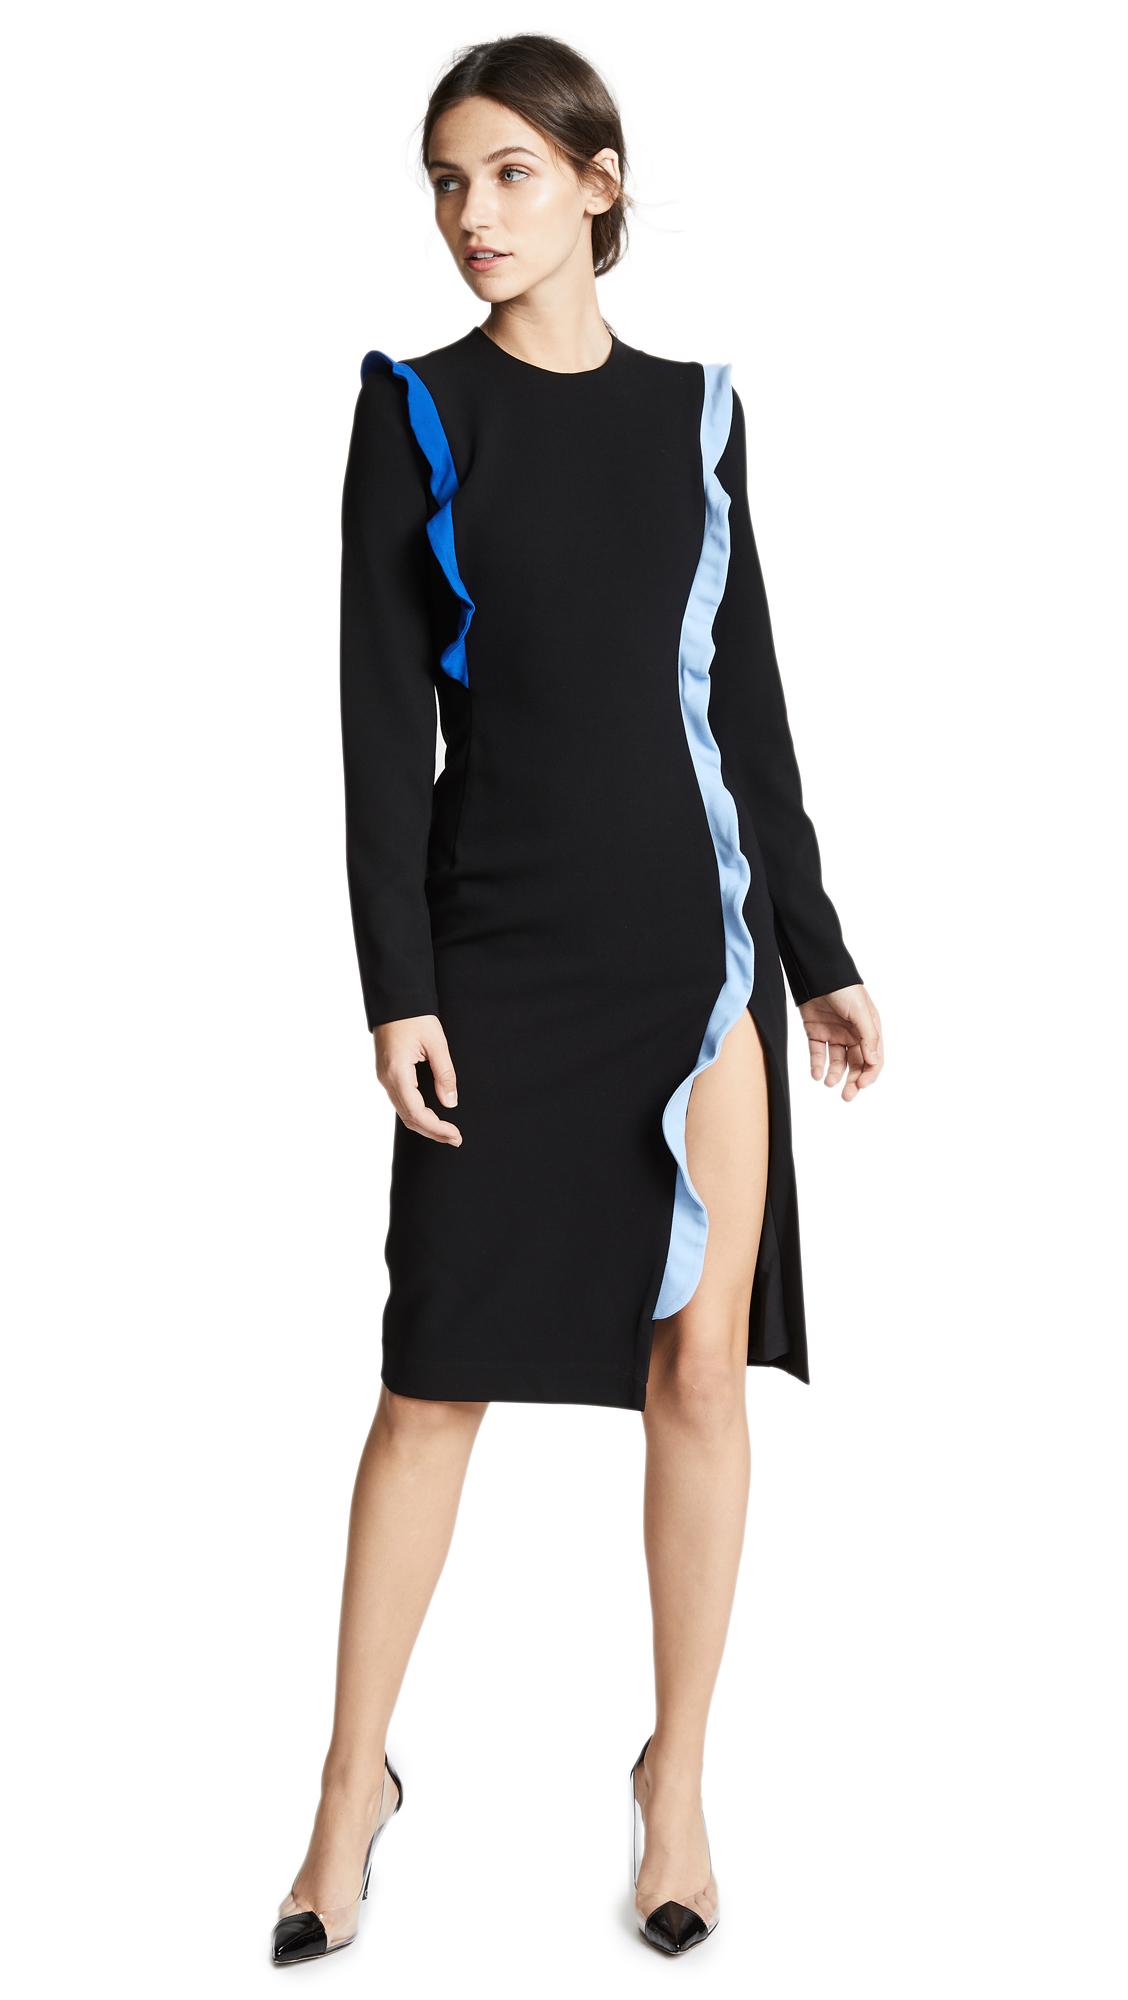 Charla Sheath Dress, Black/Shoreline/Twinkle Blue